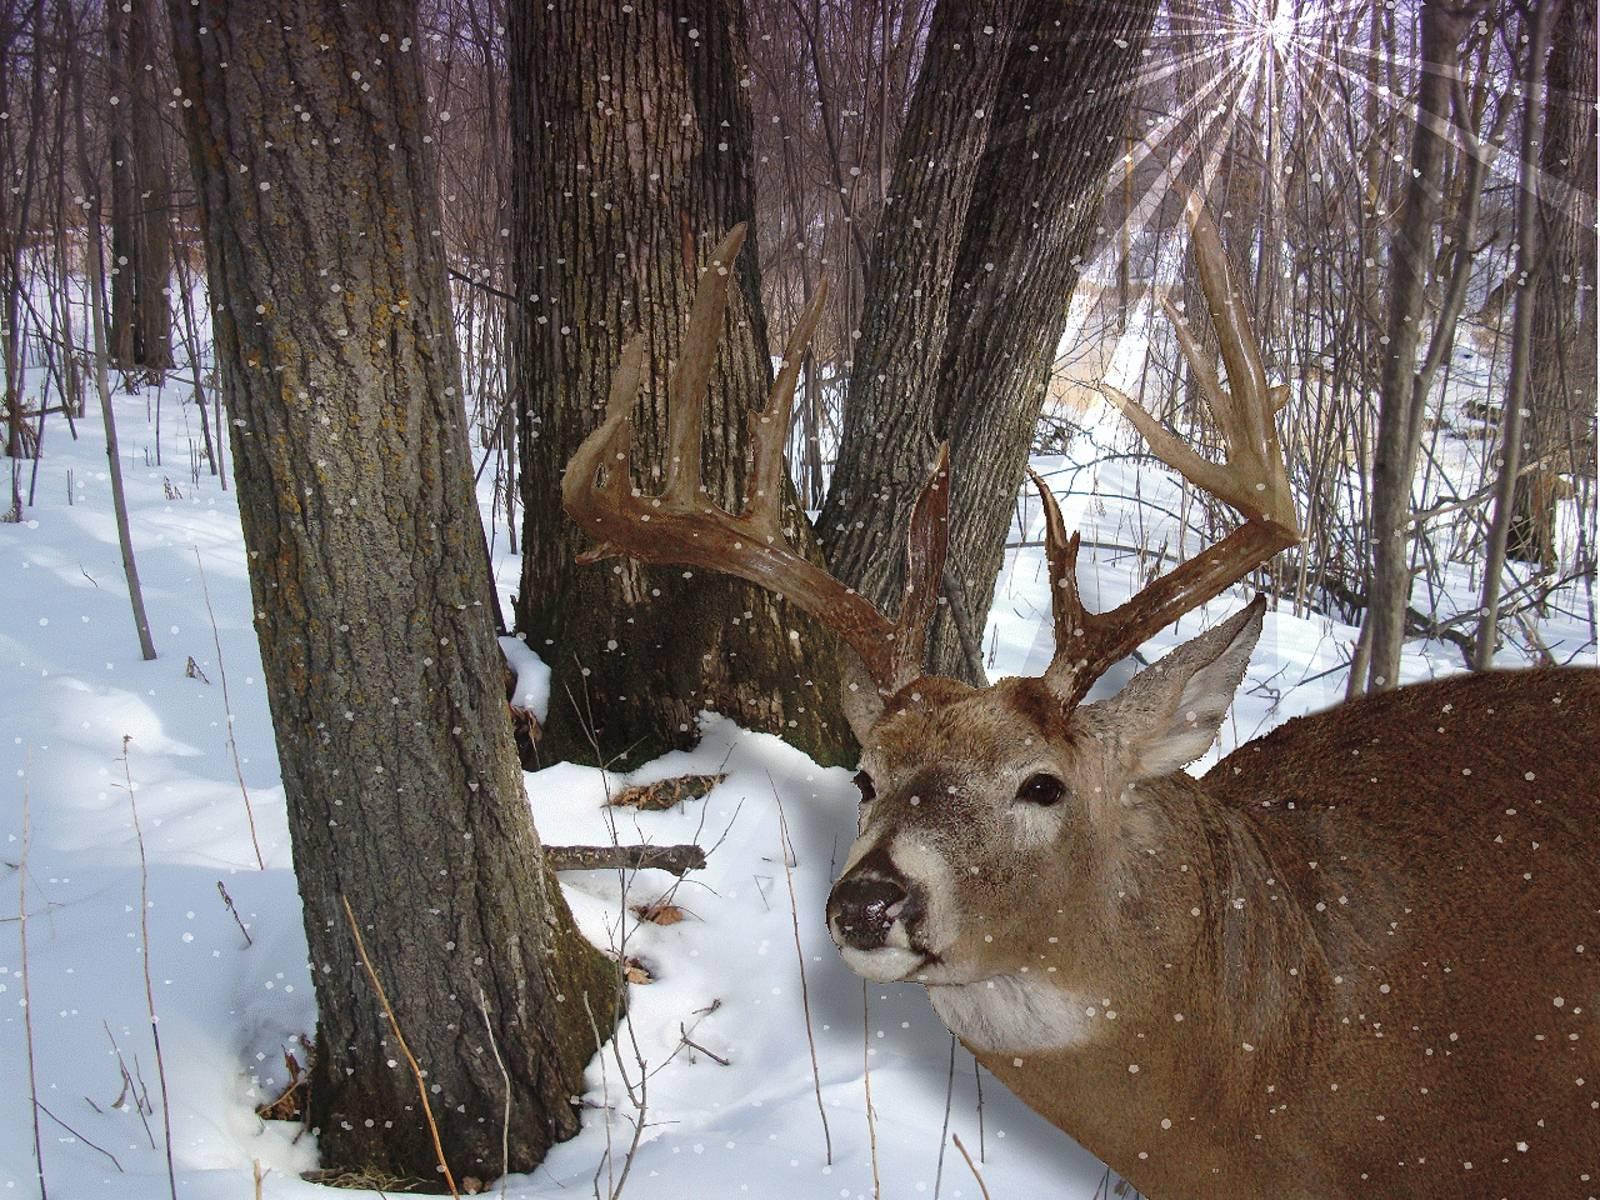 free whitetail deer wallpaper 727 hd pictures top wallpaper desktop